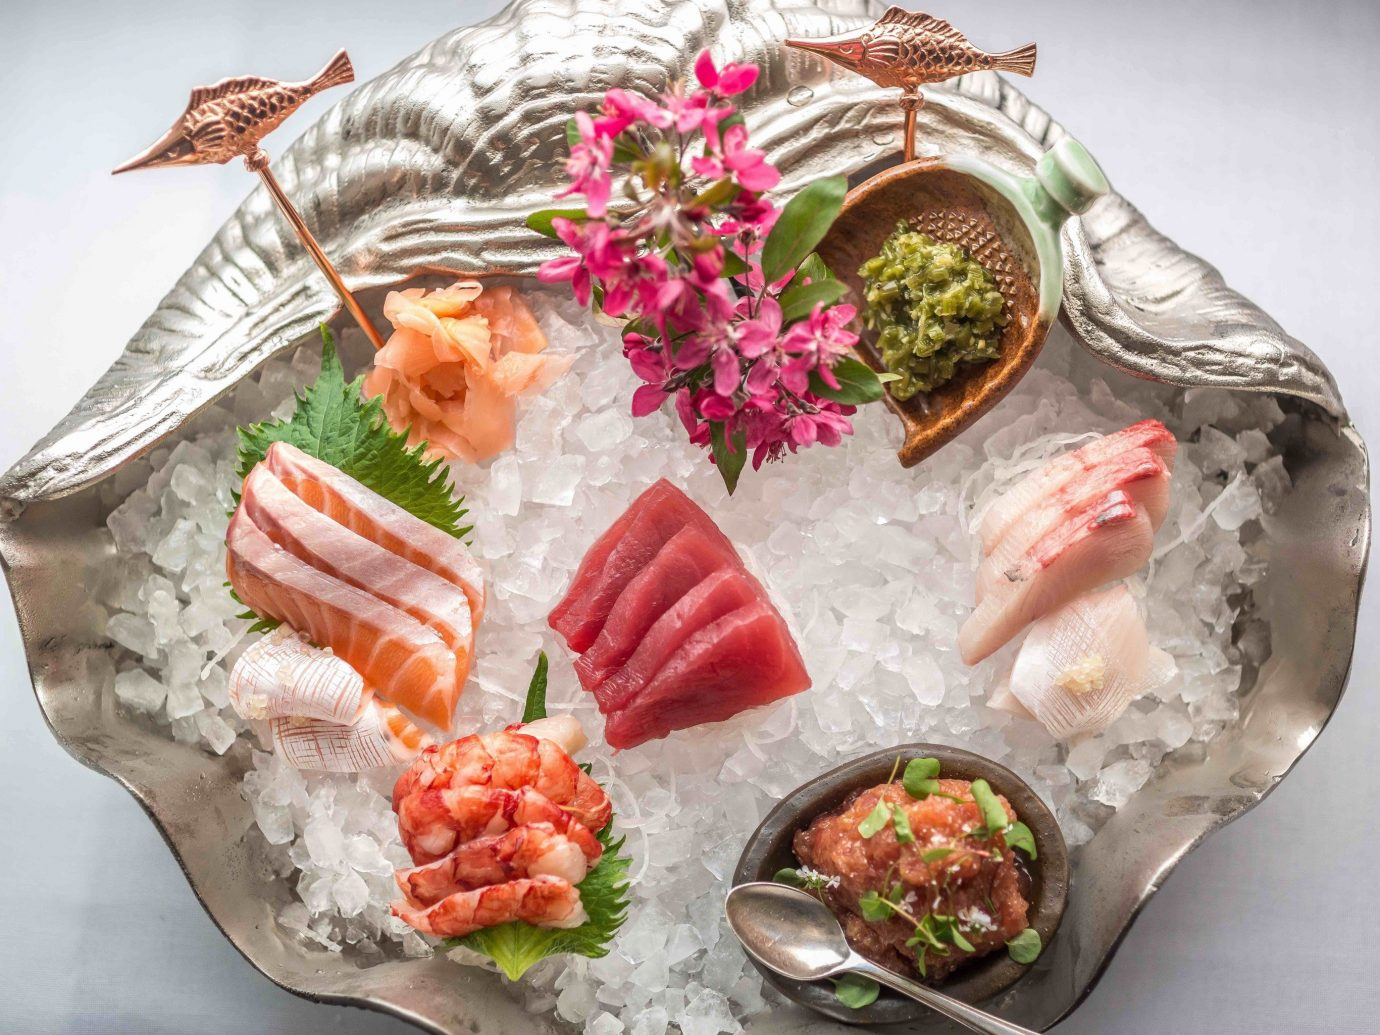 Arts + Culture dish food meal cuisine fish Seafood asian food produce